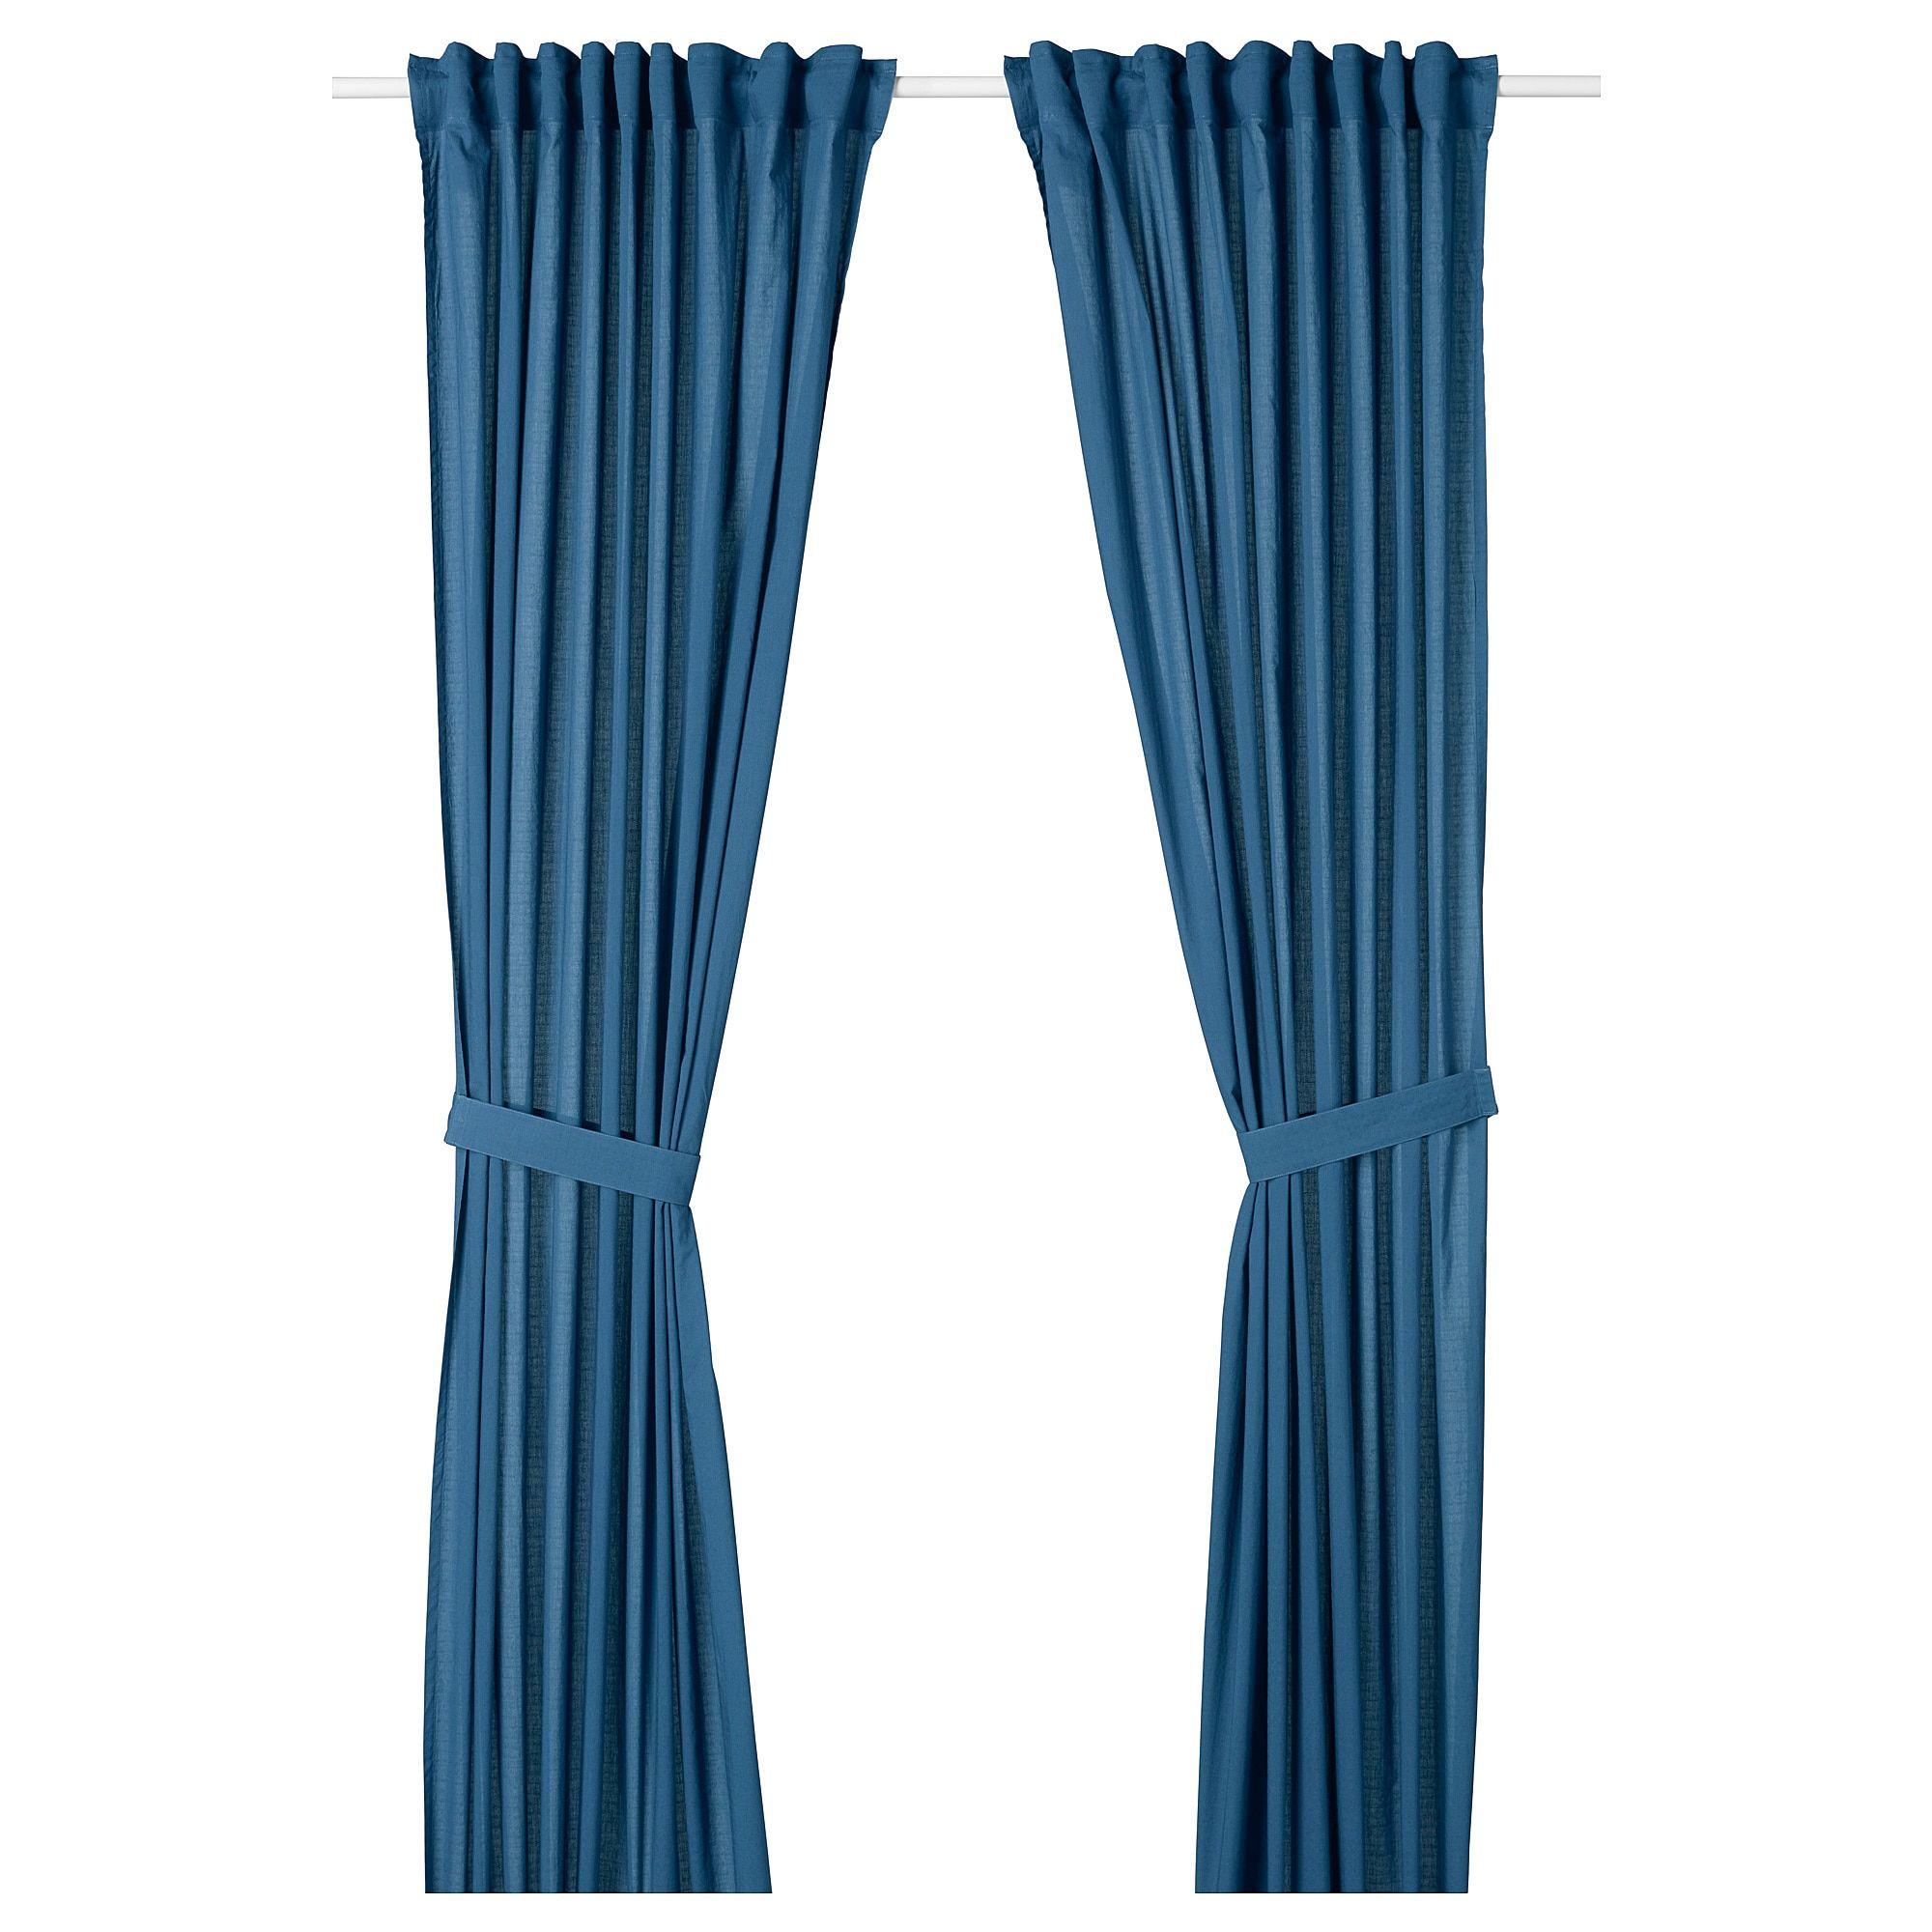 Amilde Curtains With Tie Backs 1 Pair Blue 57x98 Curtains